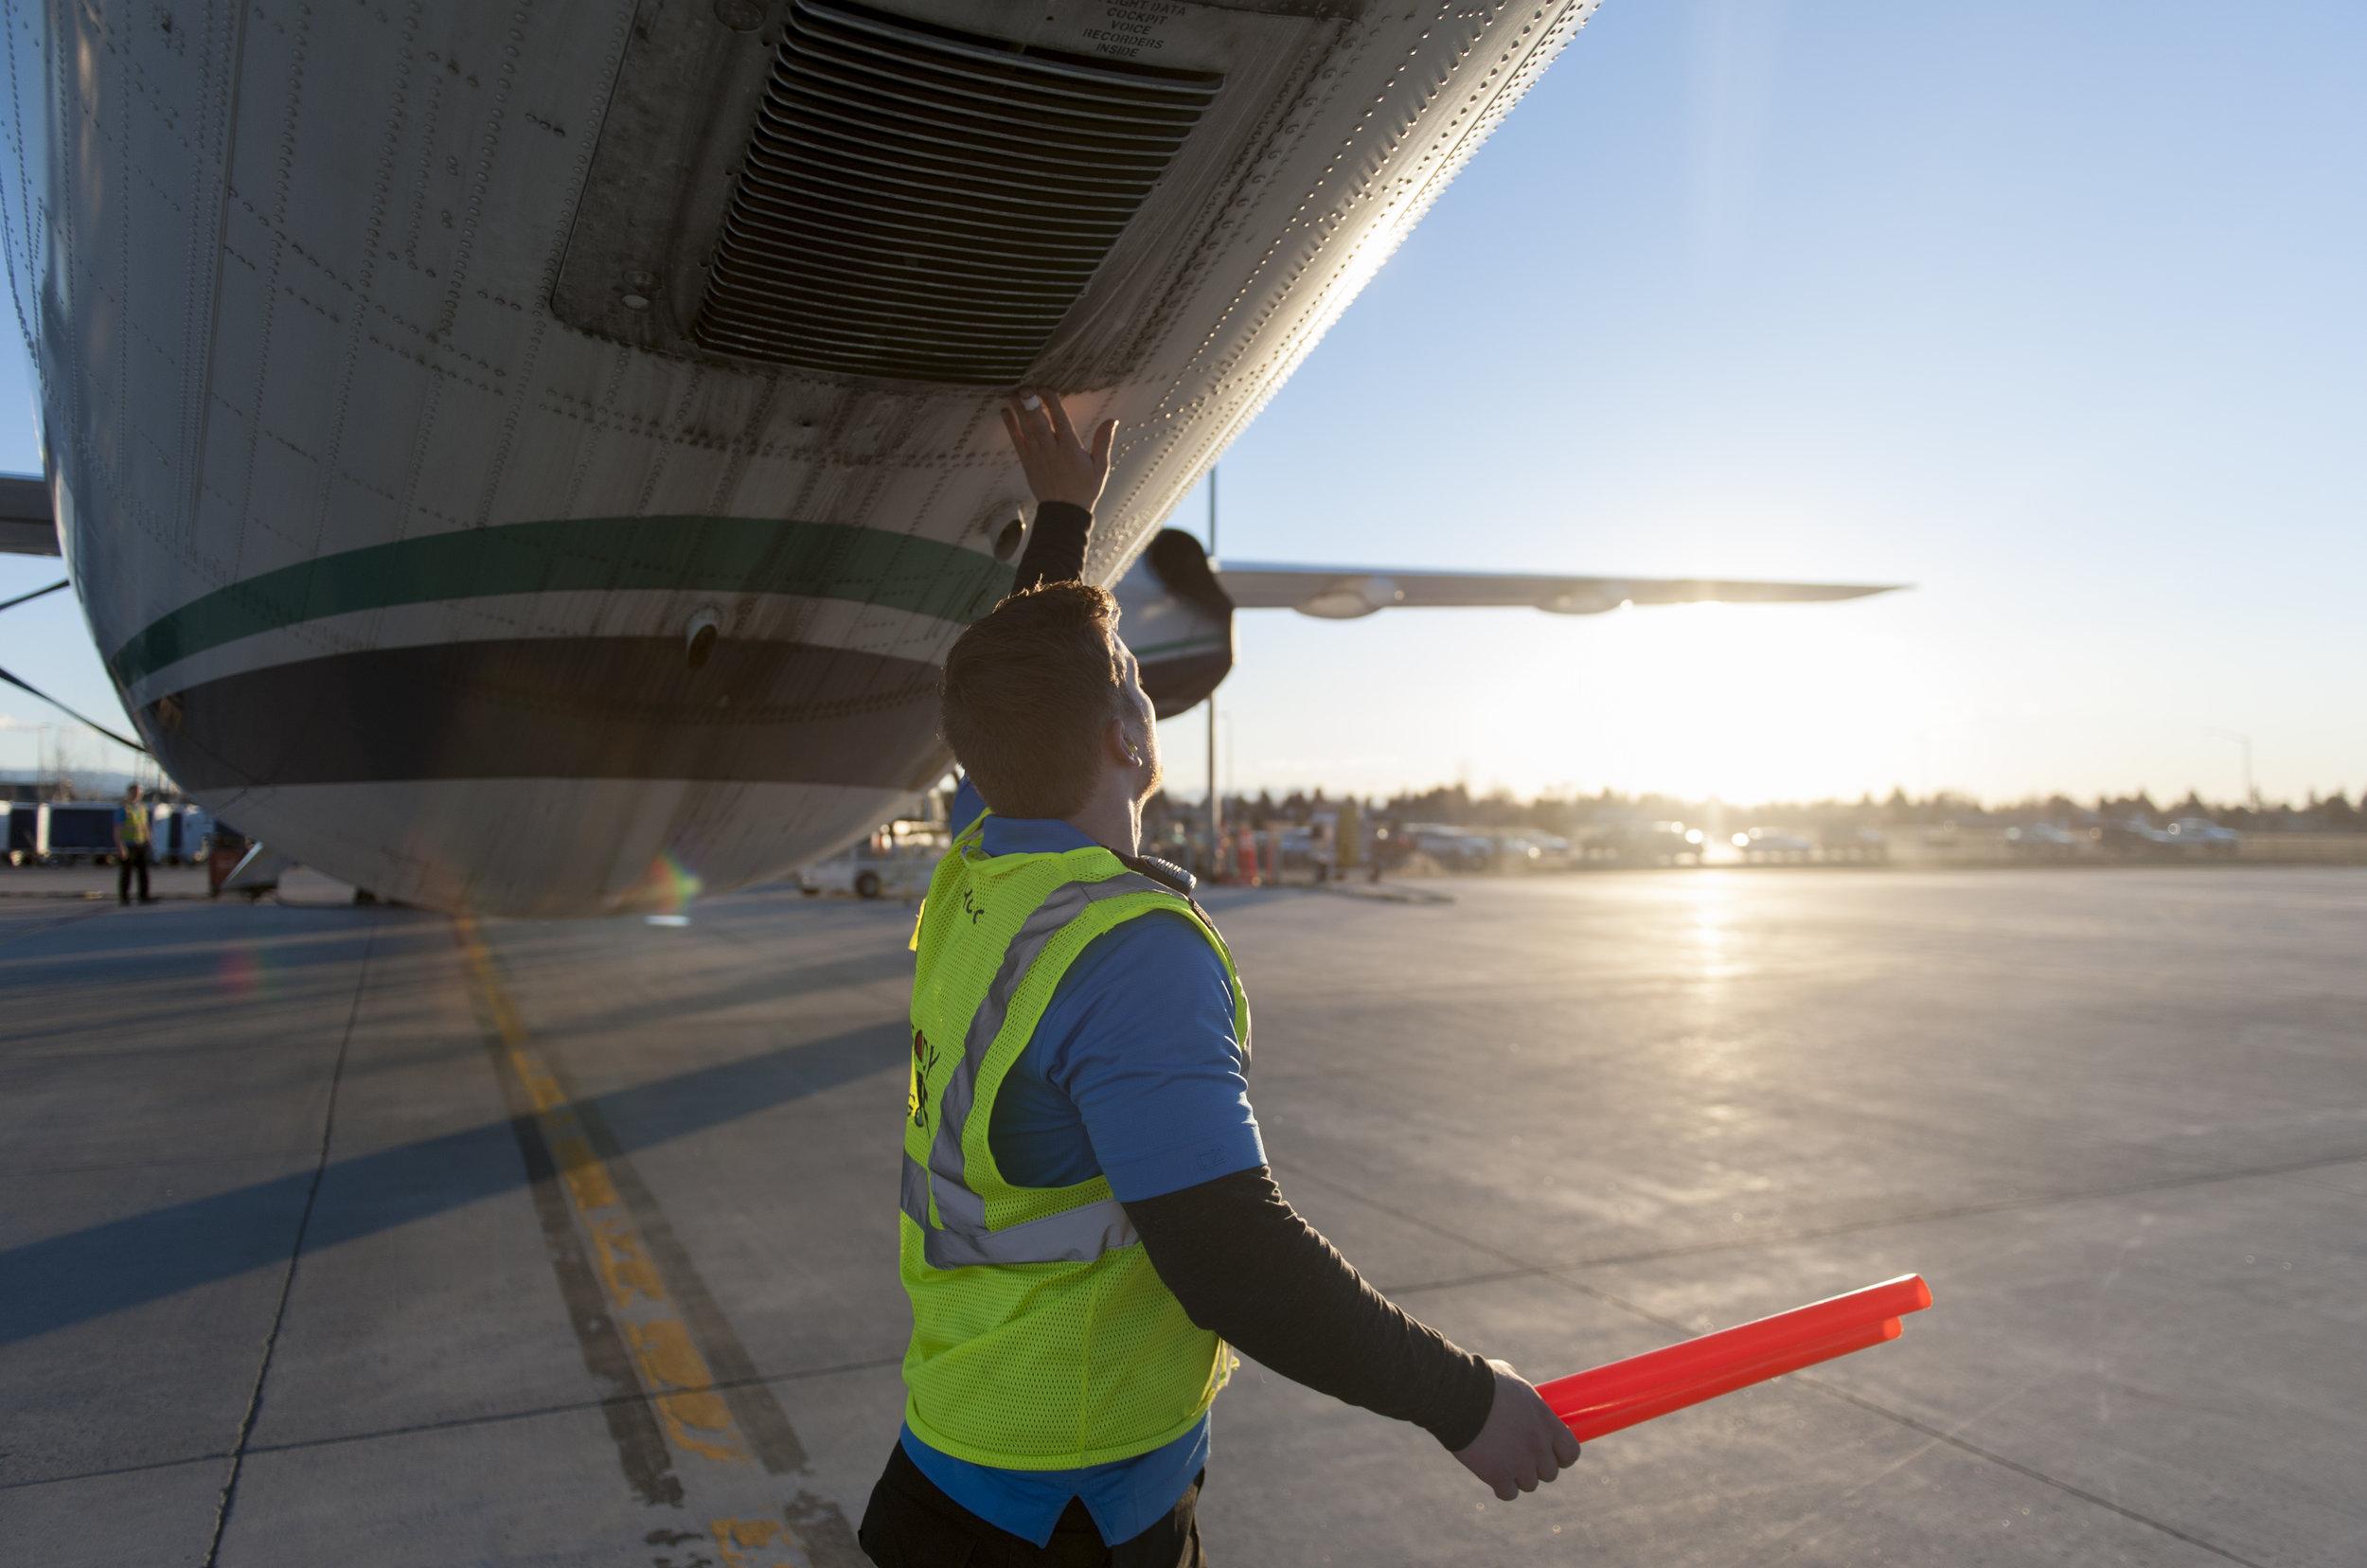 A ramp agent at Bozeman Yellowstone International Airport preforms a pre-flight walkaround on a flight bound for Seattle, Wash. Thursday, Mar. 23, 2017.